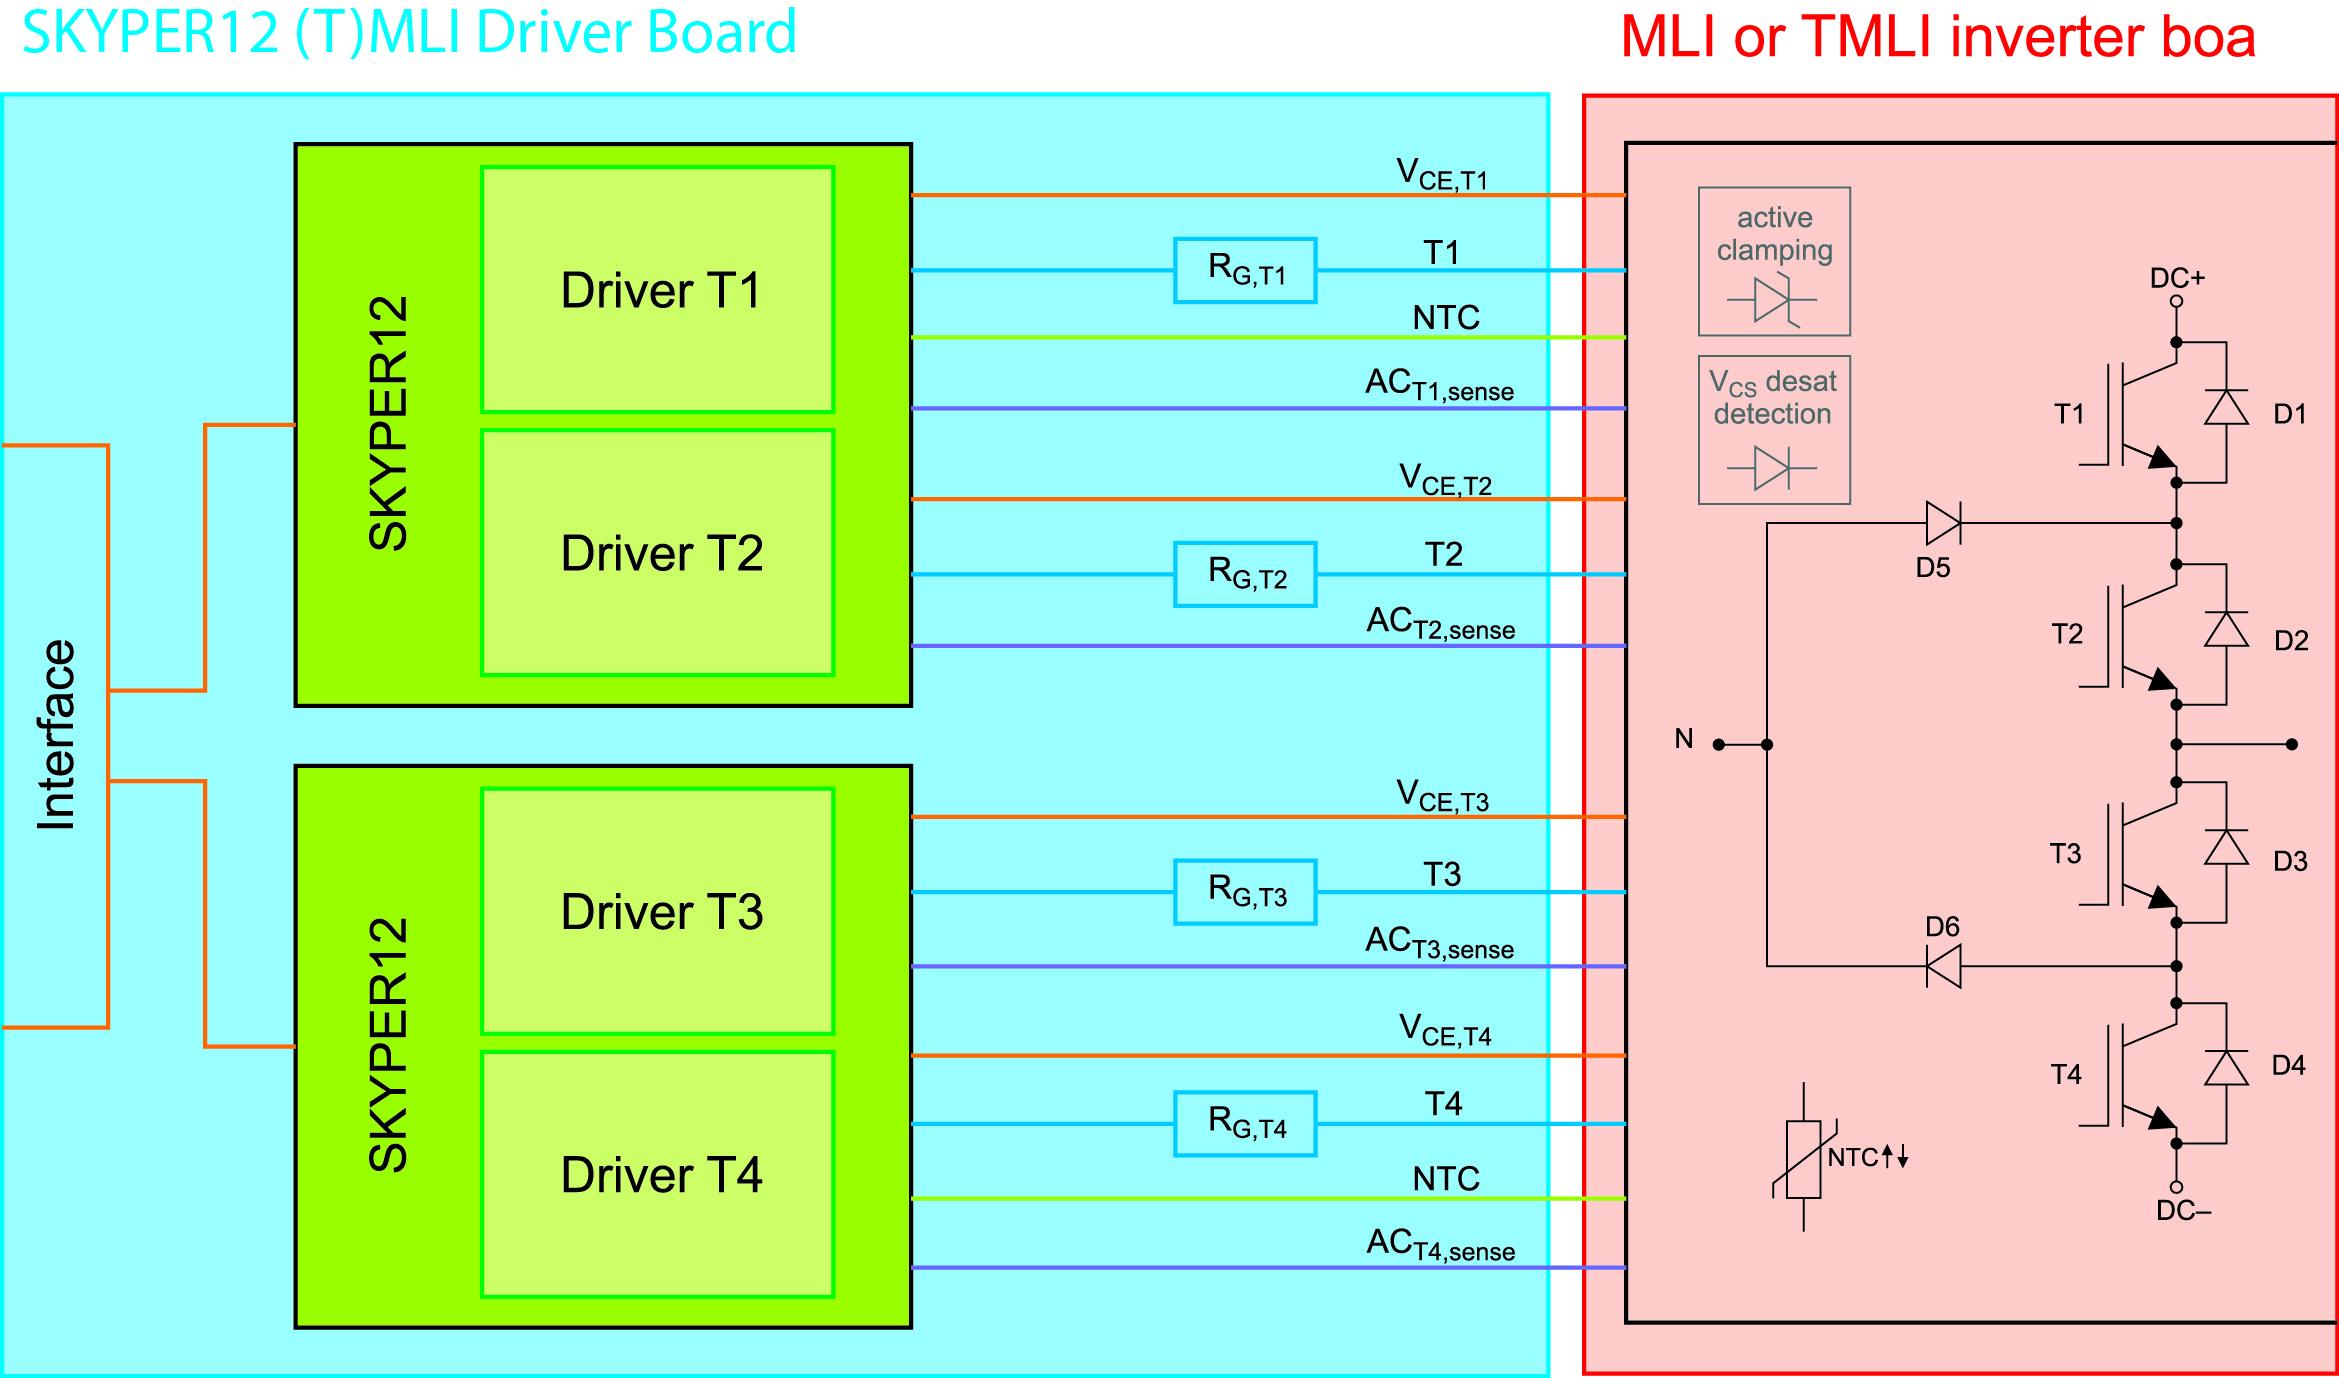 Блок-схема платы SKYPER 12 (T)MLI Driver Board